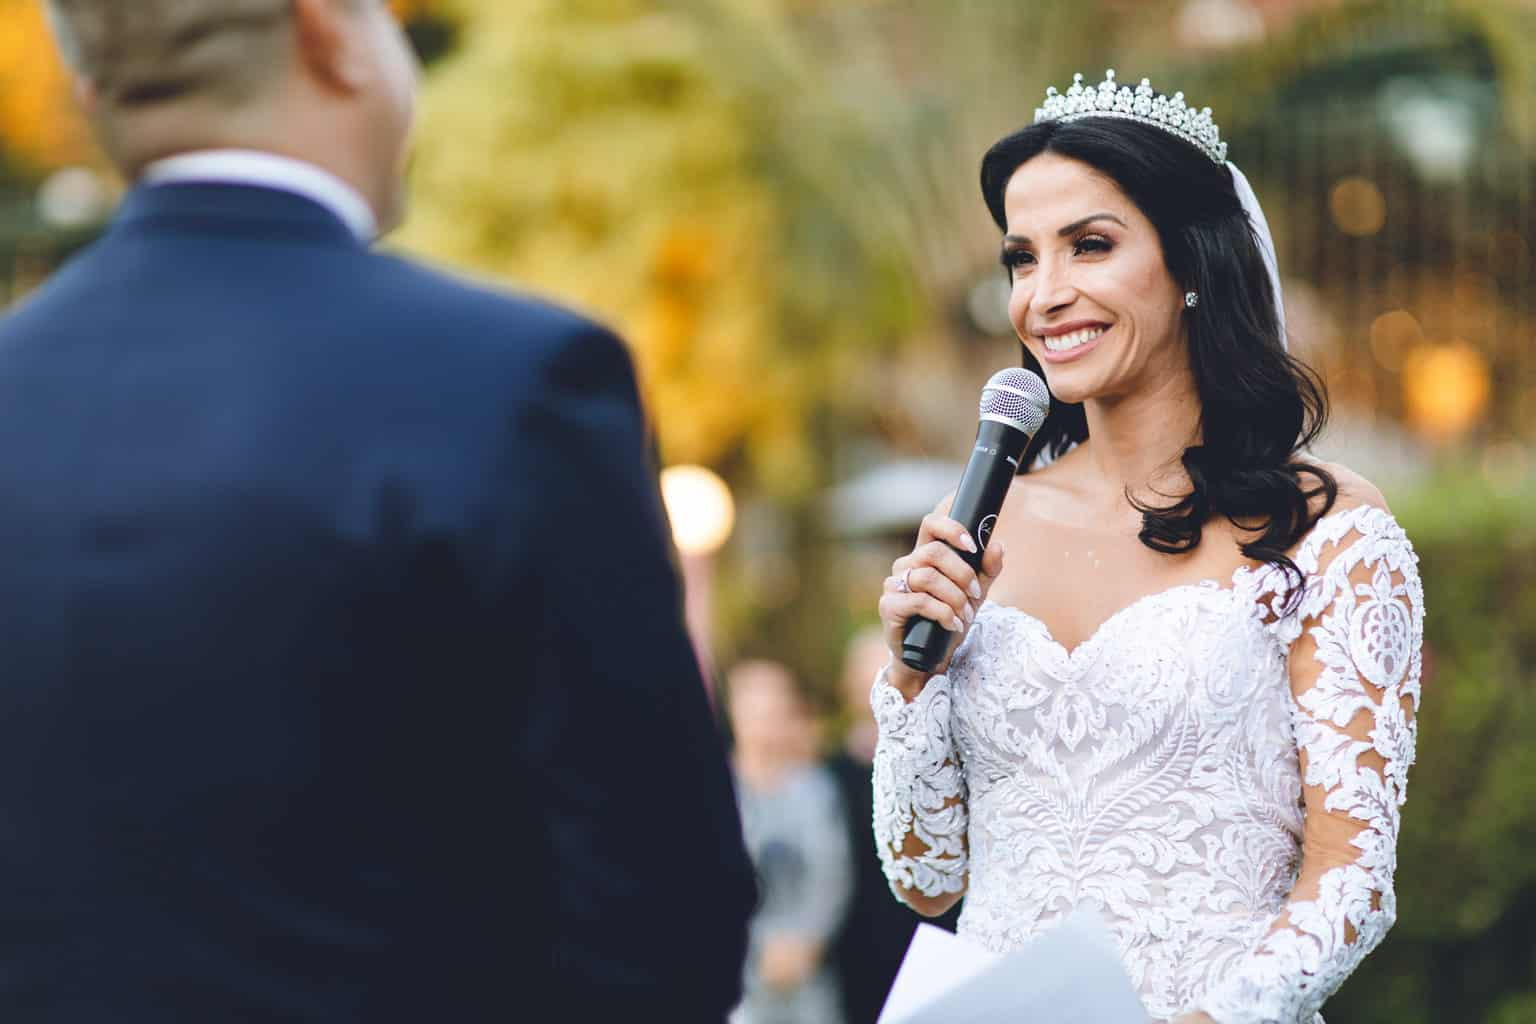 Casamento-de-Bianka-e-Nilo-Fotografia-Marcelo-Schmoeller-SC-Alameda-Casa-Rosa-03082019_bianka-e-nilo_1675